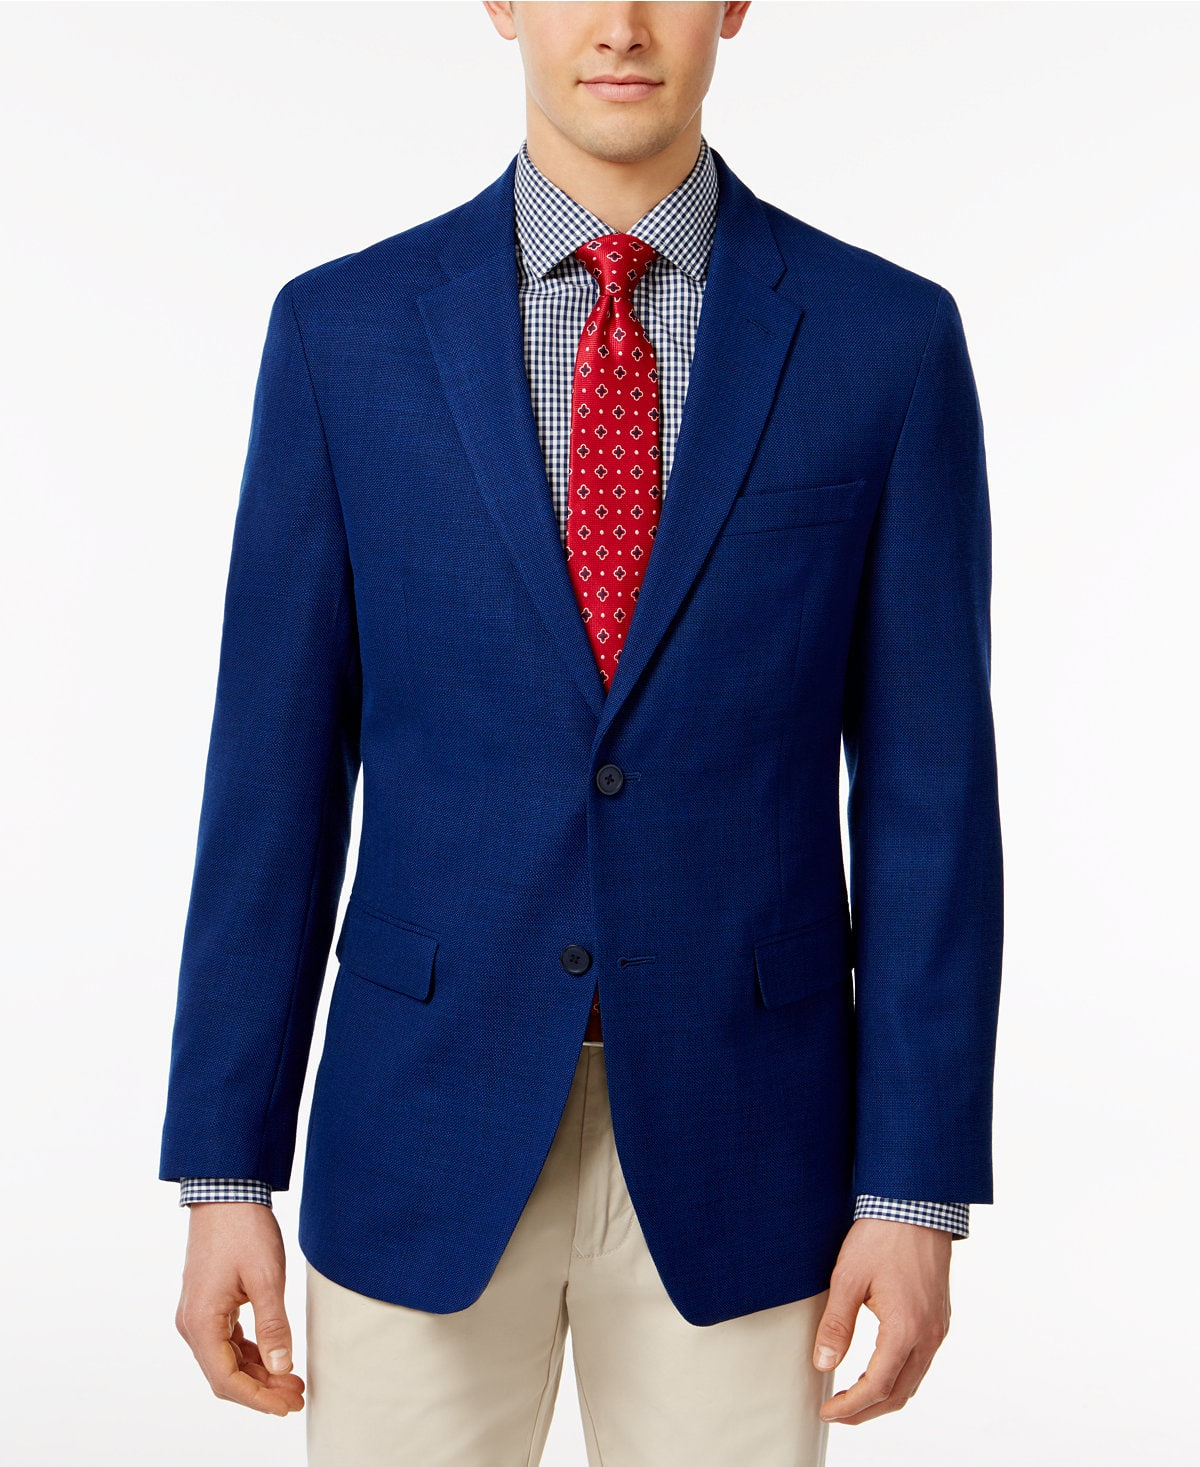 Tommy Hilfiger Men's Slim Fit Royal Blue Stretch Performance Sport Coat $44.23 + Free Shipping